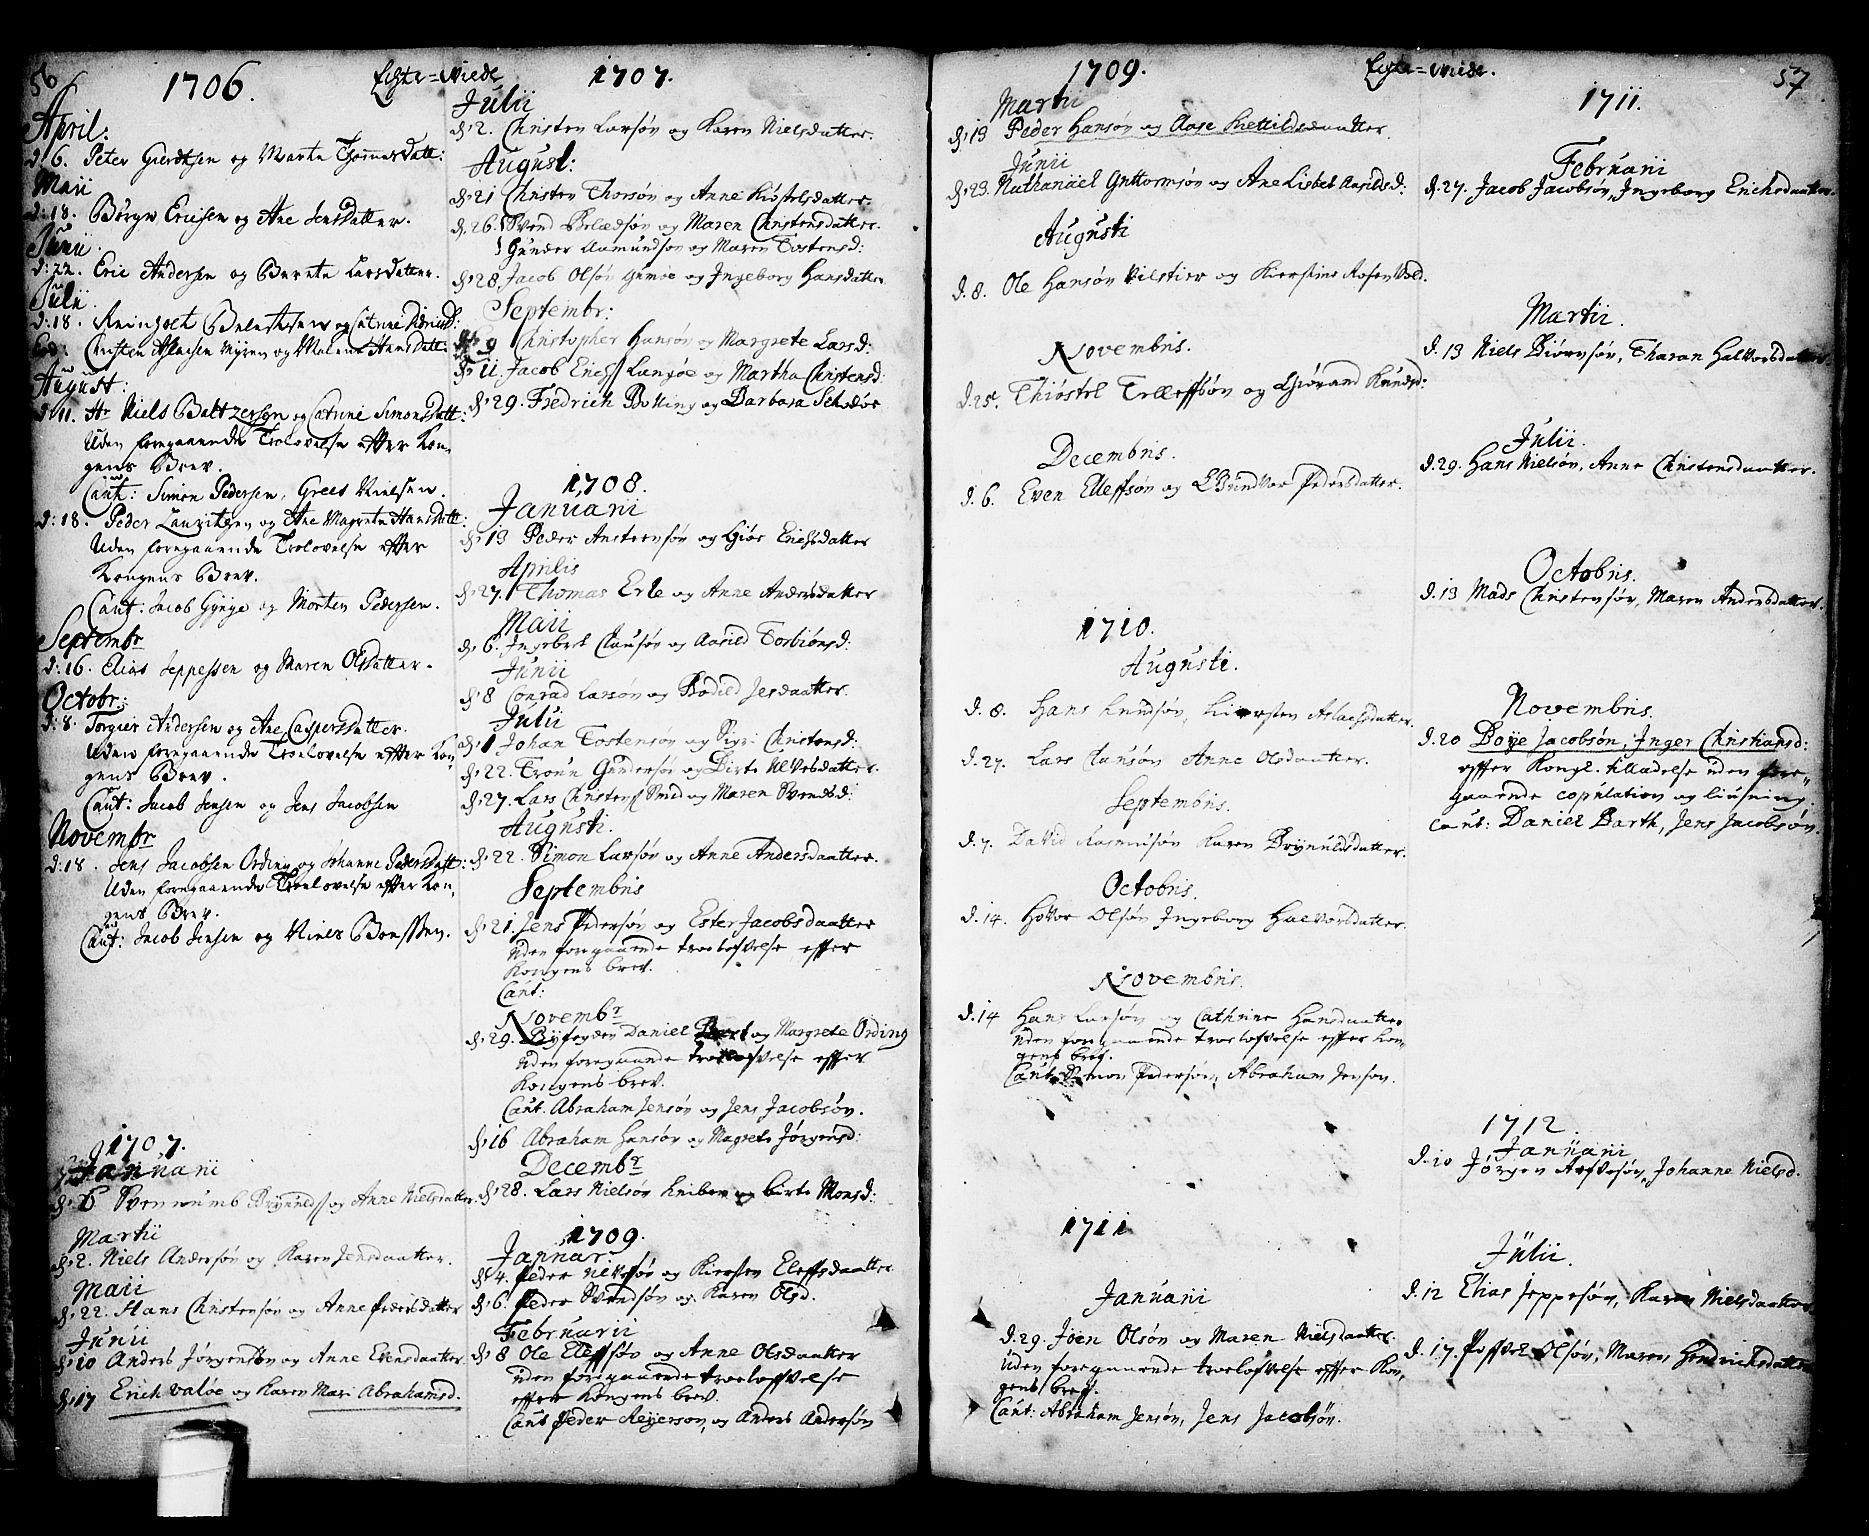 SAKO, Kragerø kirkebøker, F/Fa/L0001: Ministerialbok nr. 1, 1702-1766, s. 56-57